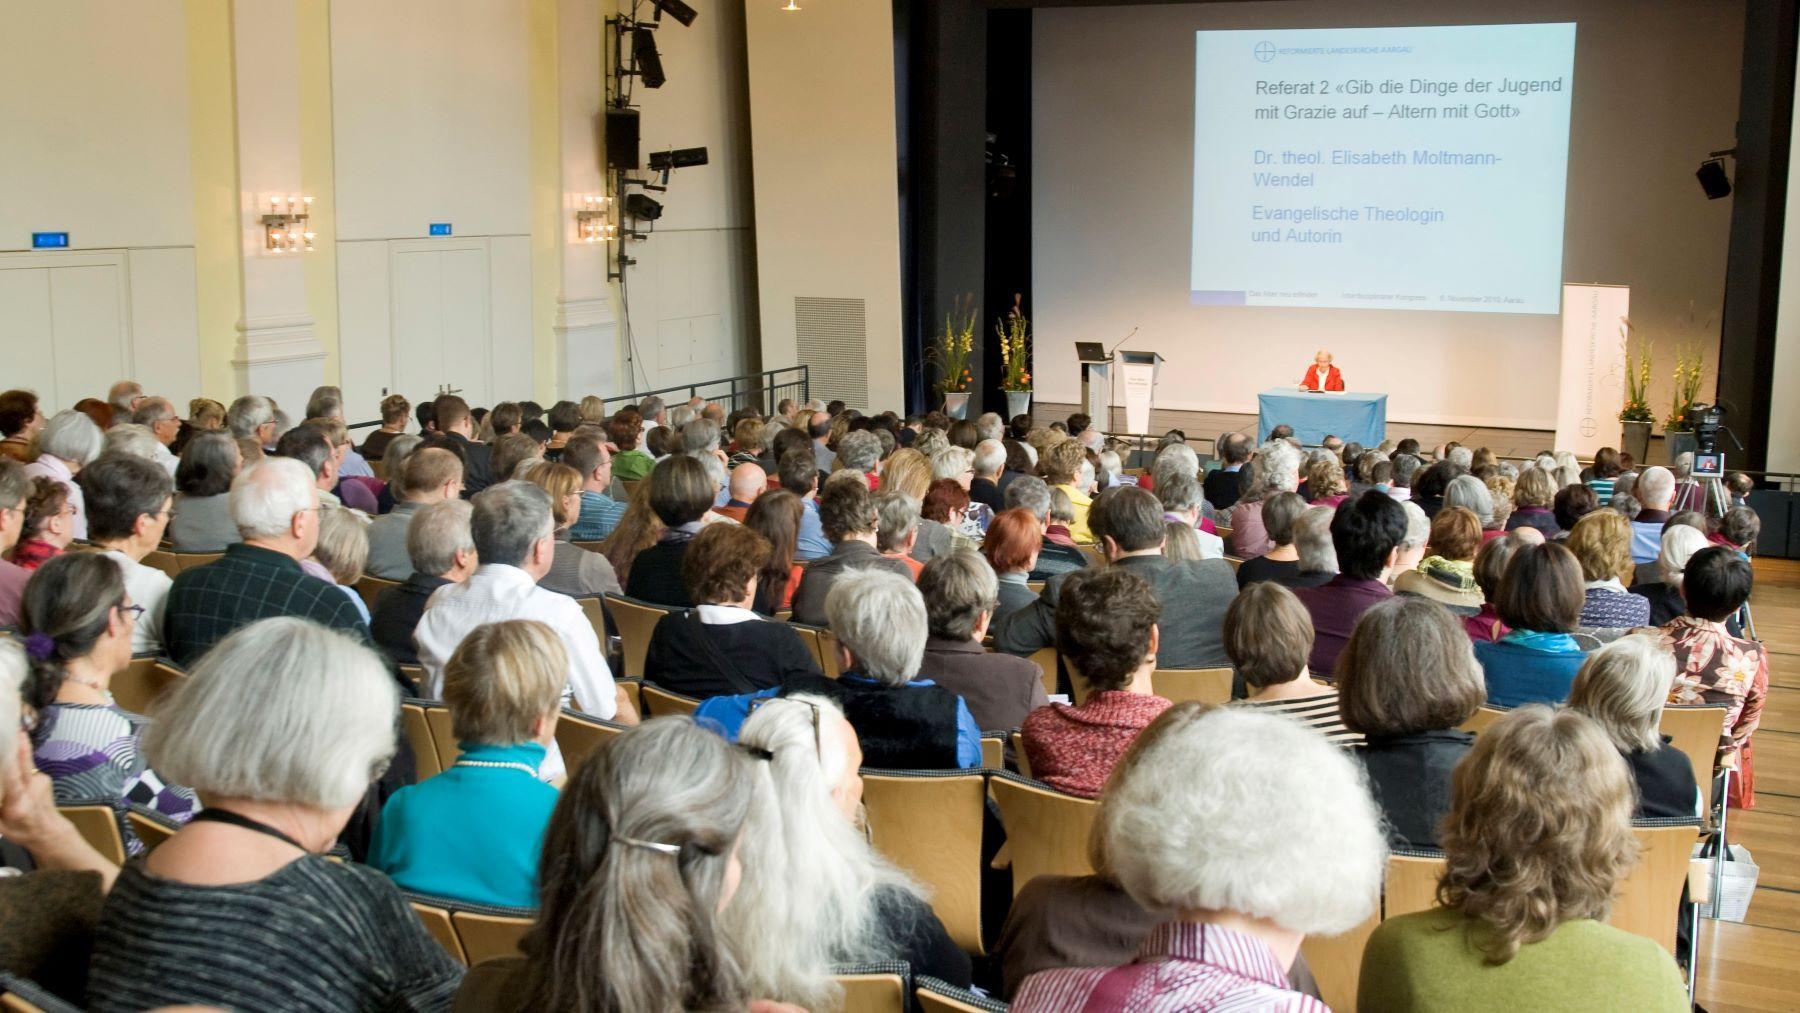 Kongress2010 Publikum Referat2 1800 16 9